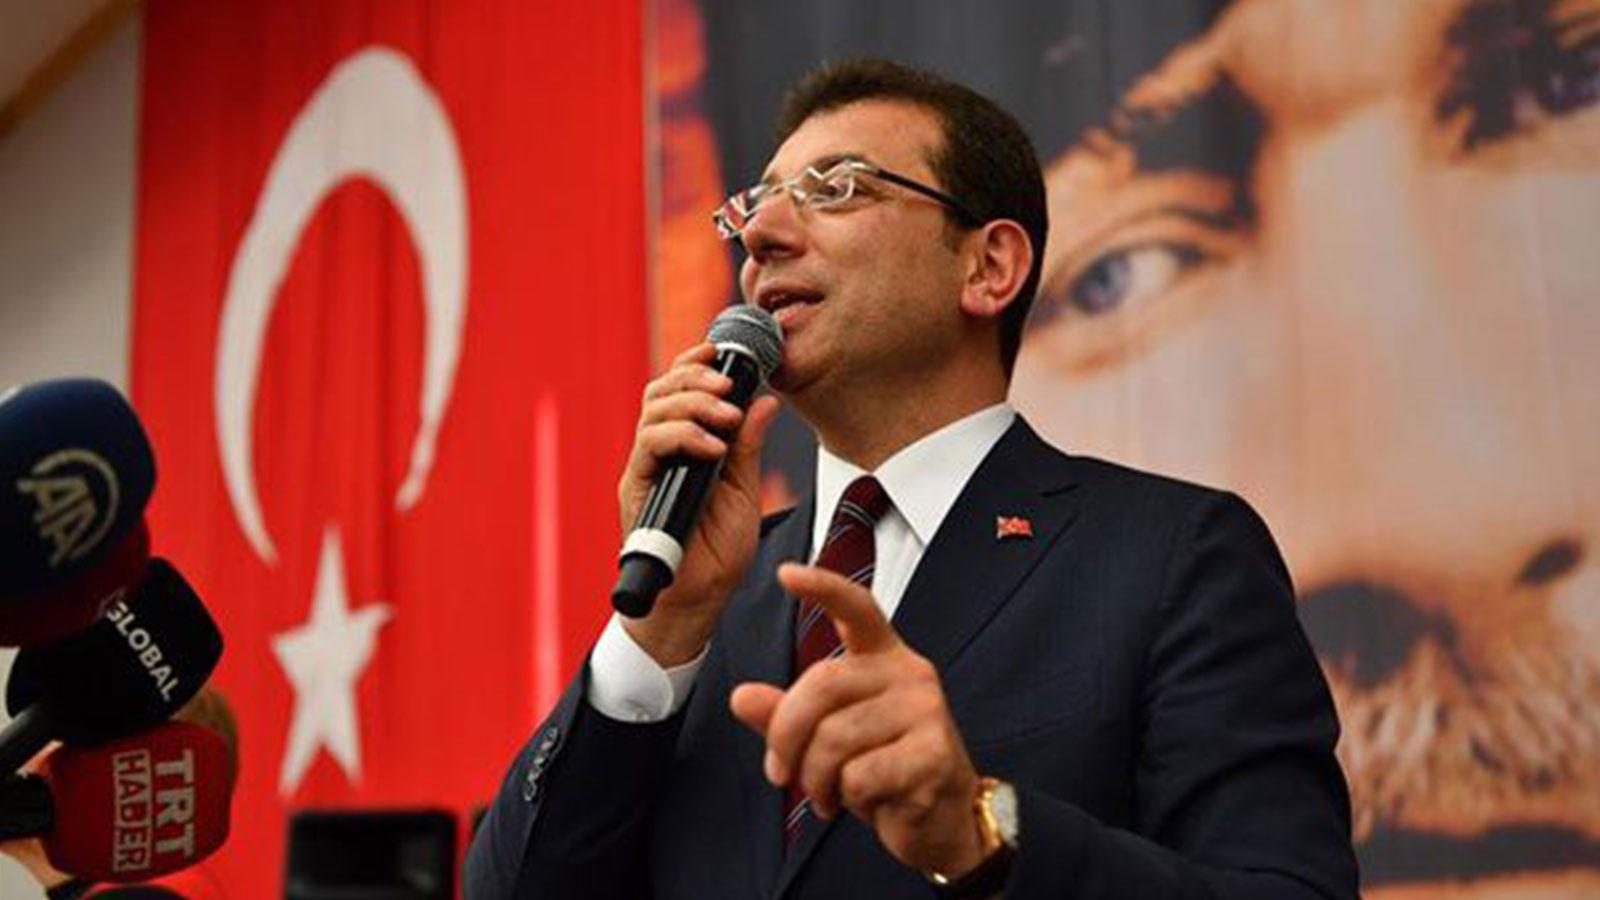 Istanbul mayor opposes Erdogan policy, calls for curfew